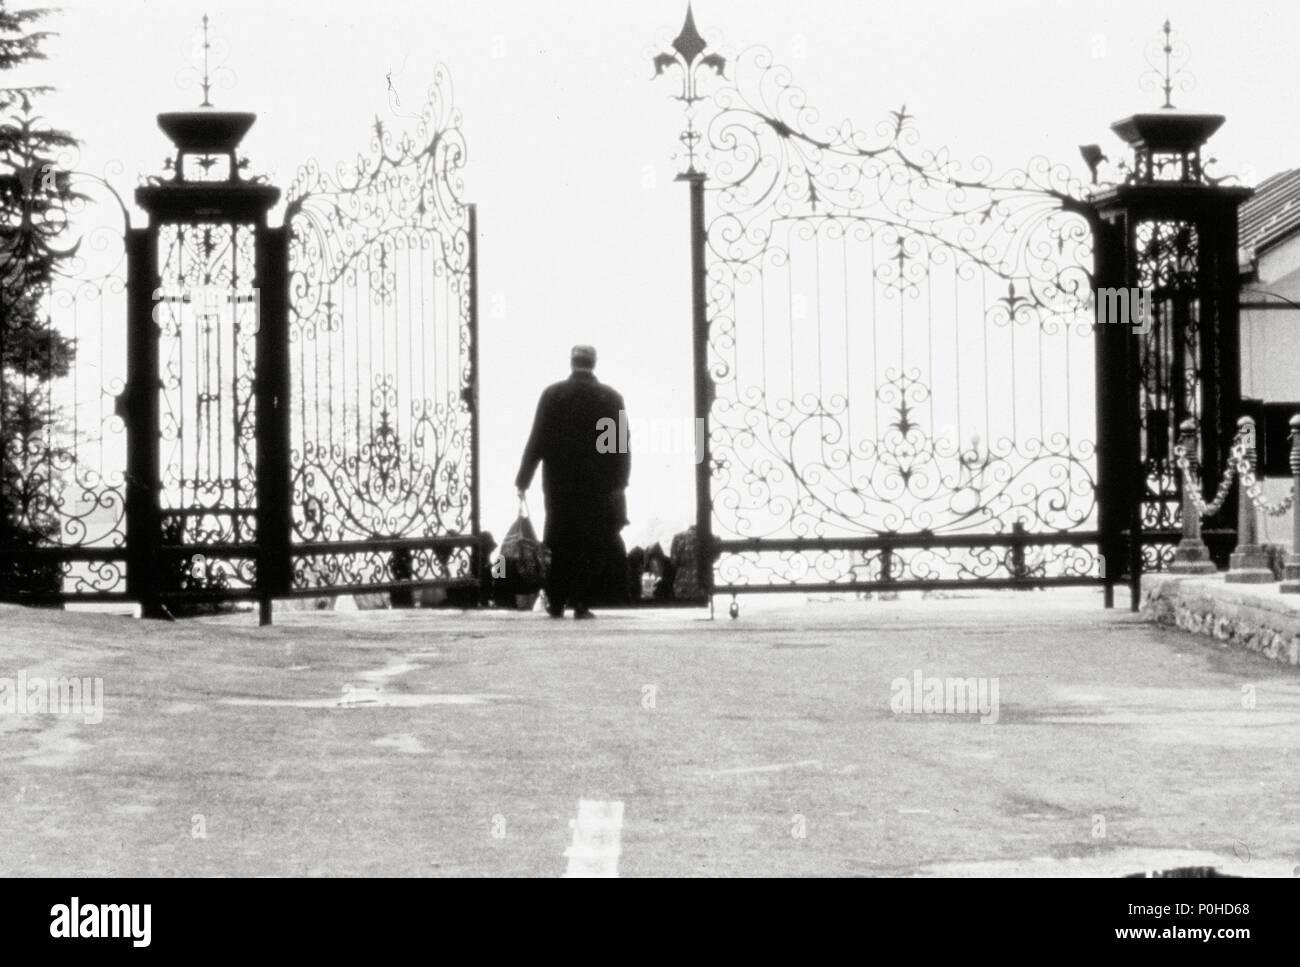 English Title A TASTE OF CHERRY Film Director ABBAS KIAROSTAMI Year 1997 Stars HOMAYOUN ERSHAD